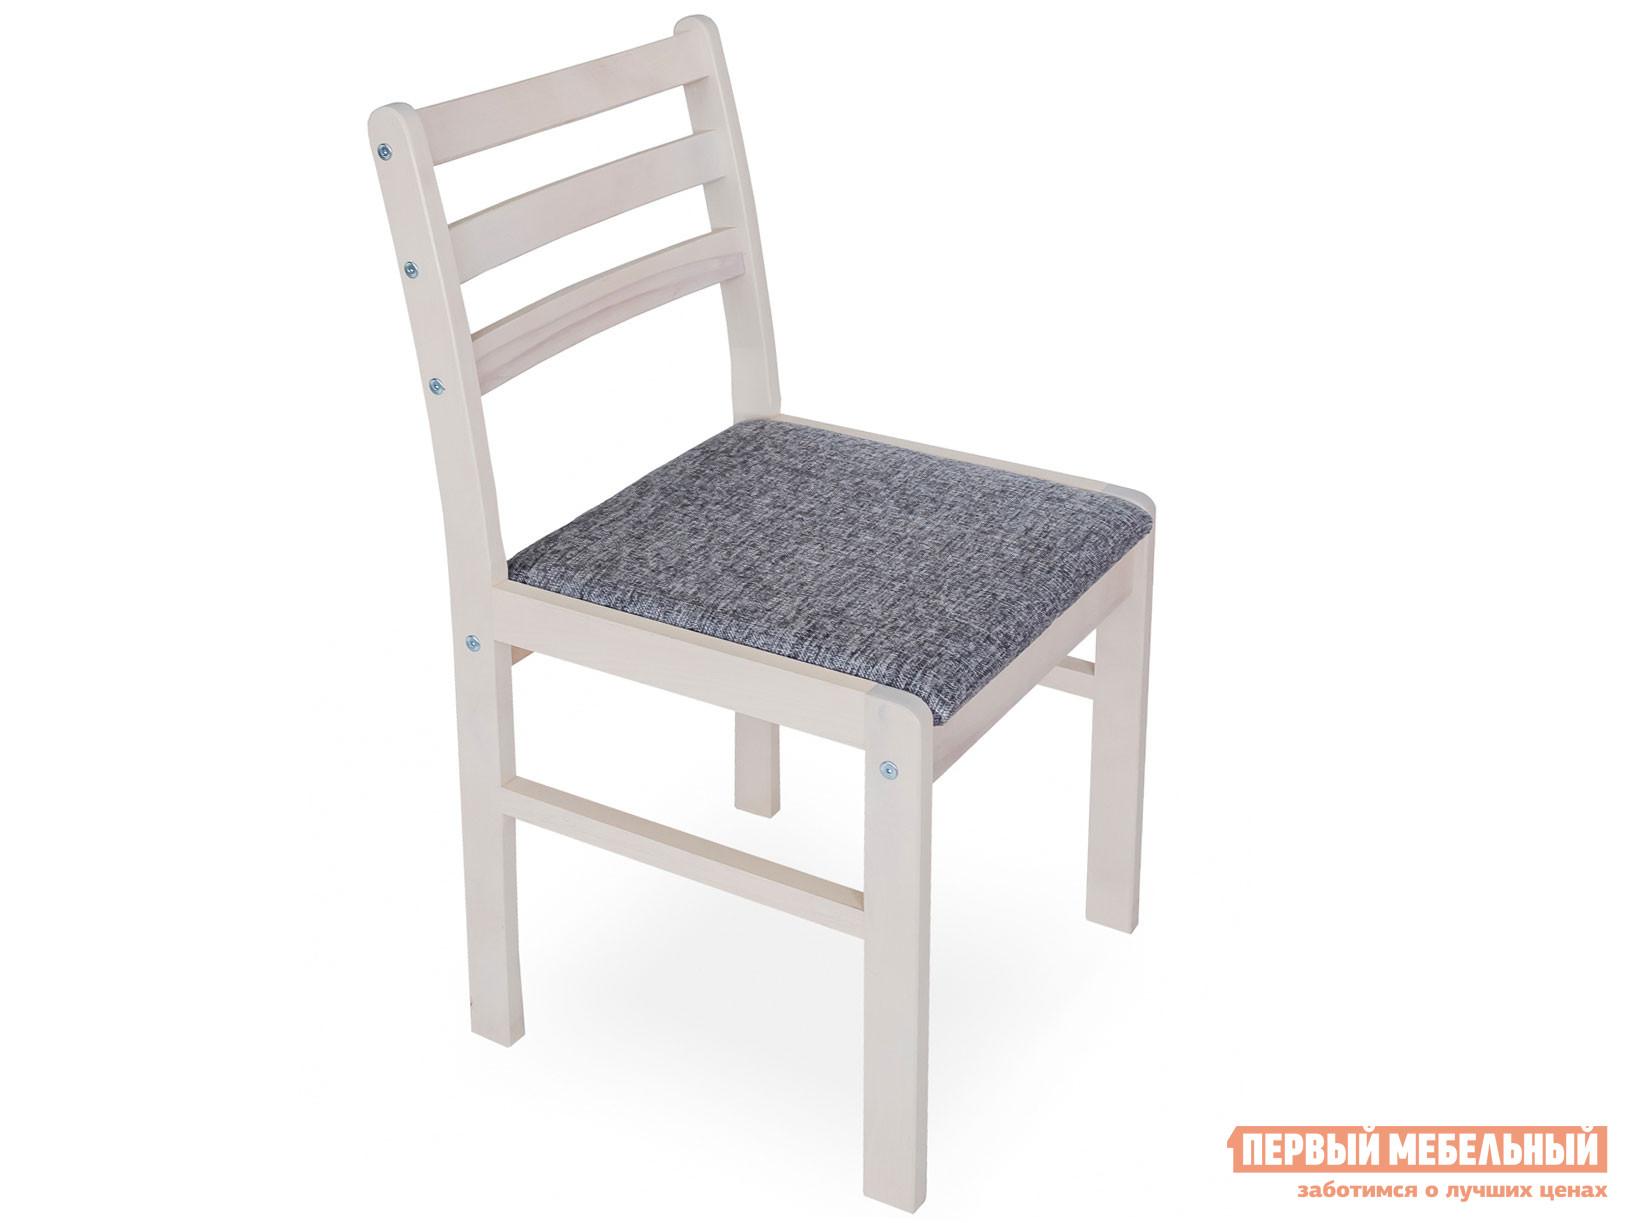 Стул Стул полумягкий Выбеленная береза / Модерн Серый (1 кат.), ткань фото